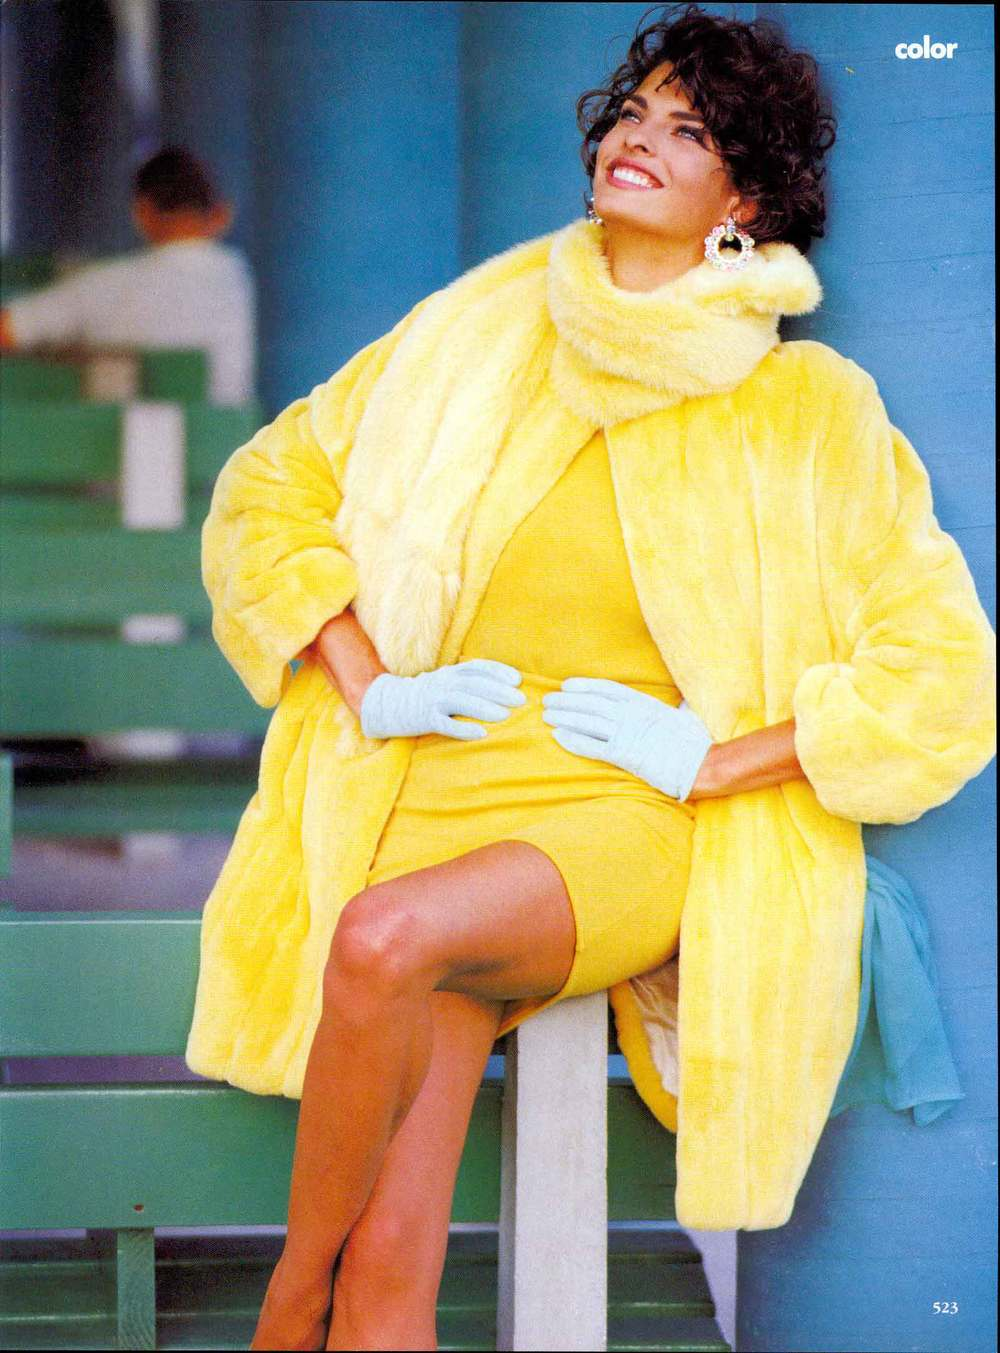 linda-smile-vogue-usa-1990